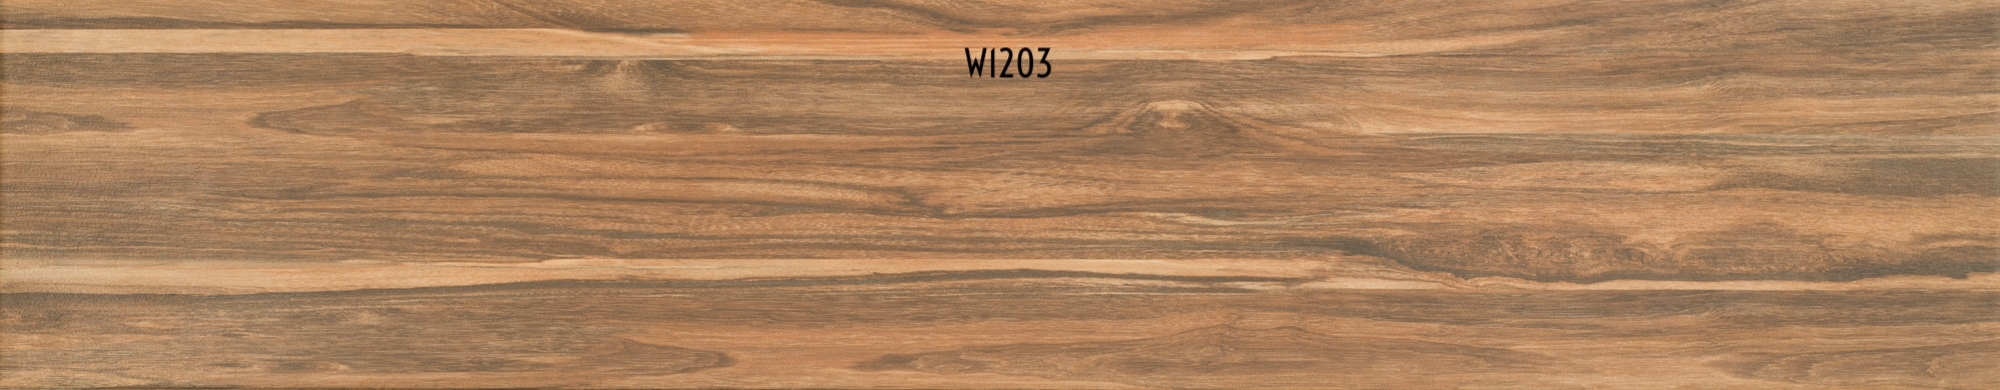 W1203